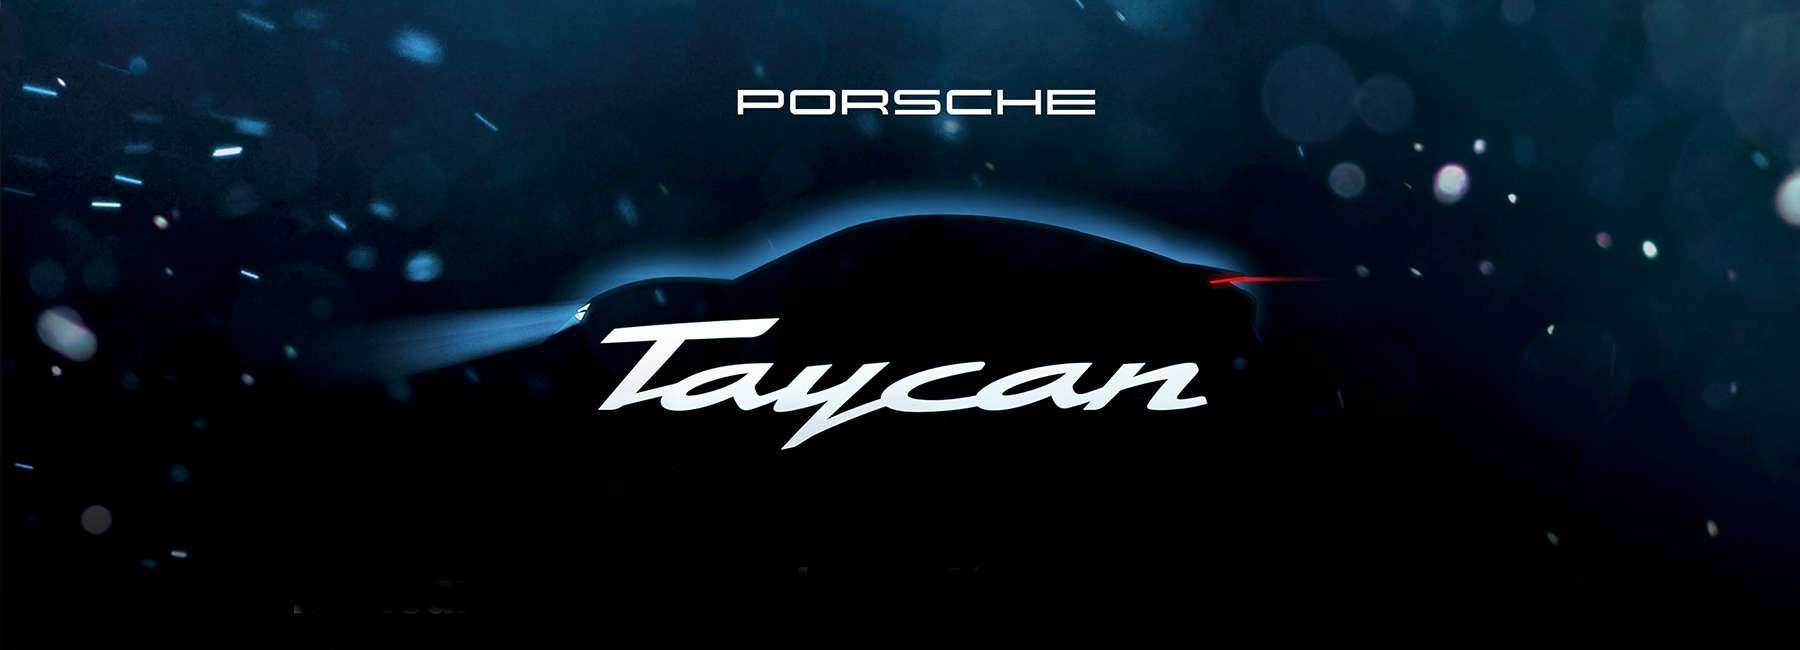 2020 Porsche Taycan Specs Range Porsche Electric Car Review